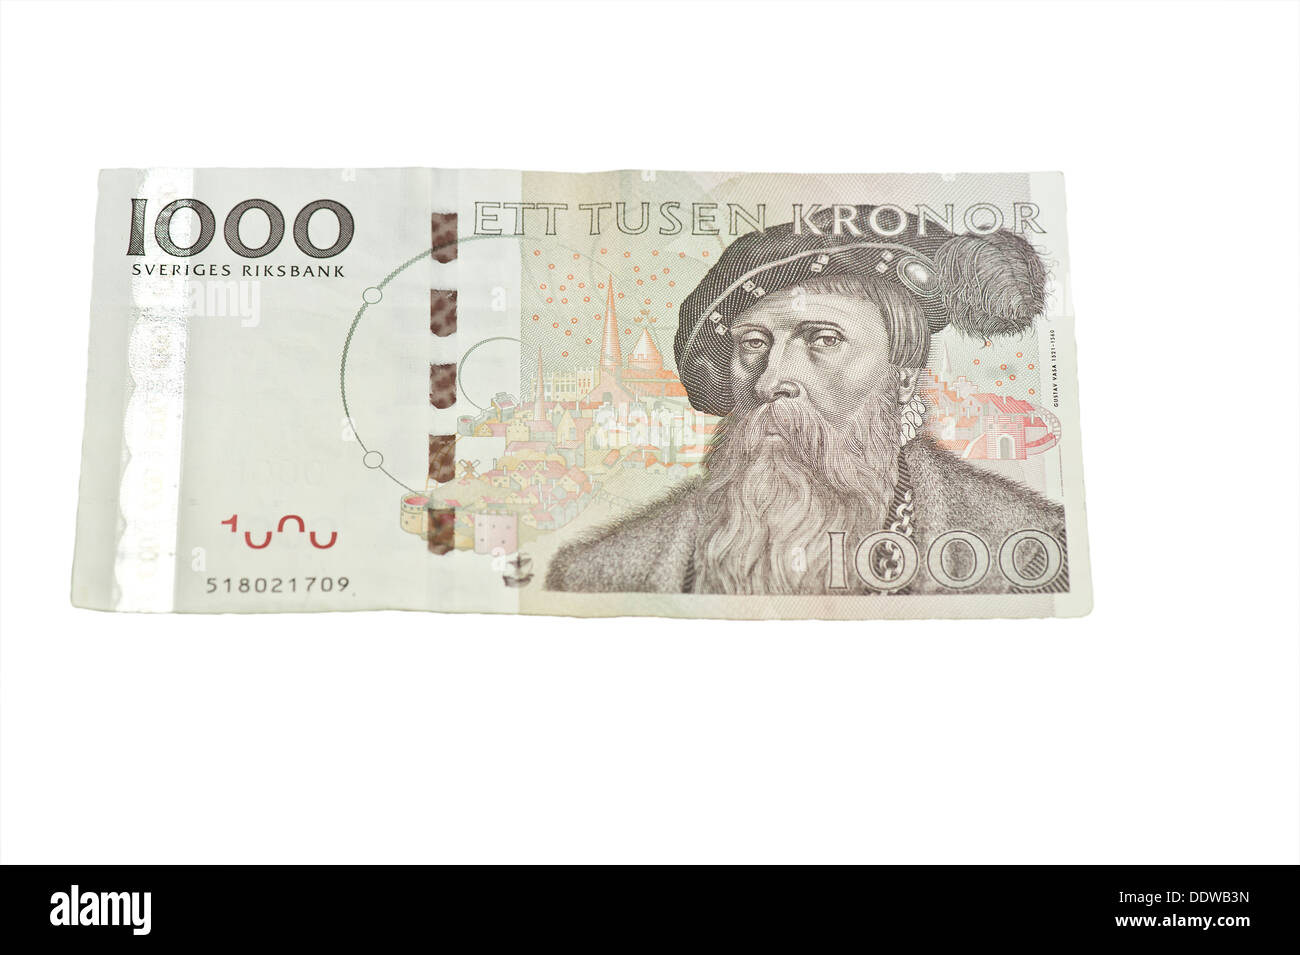 Closeup of a one thousand Swedish kronor bill - Stock Image